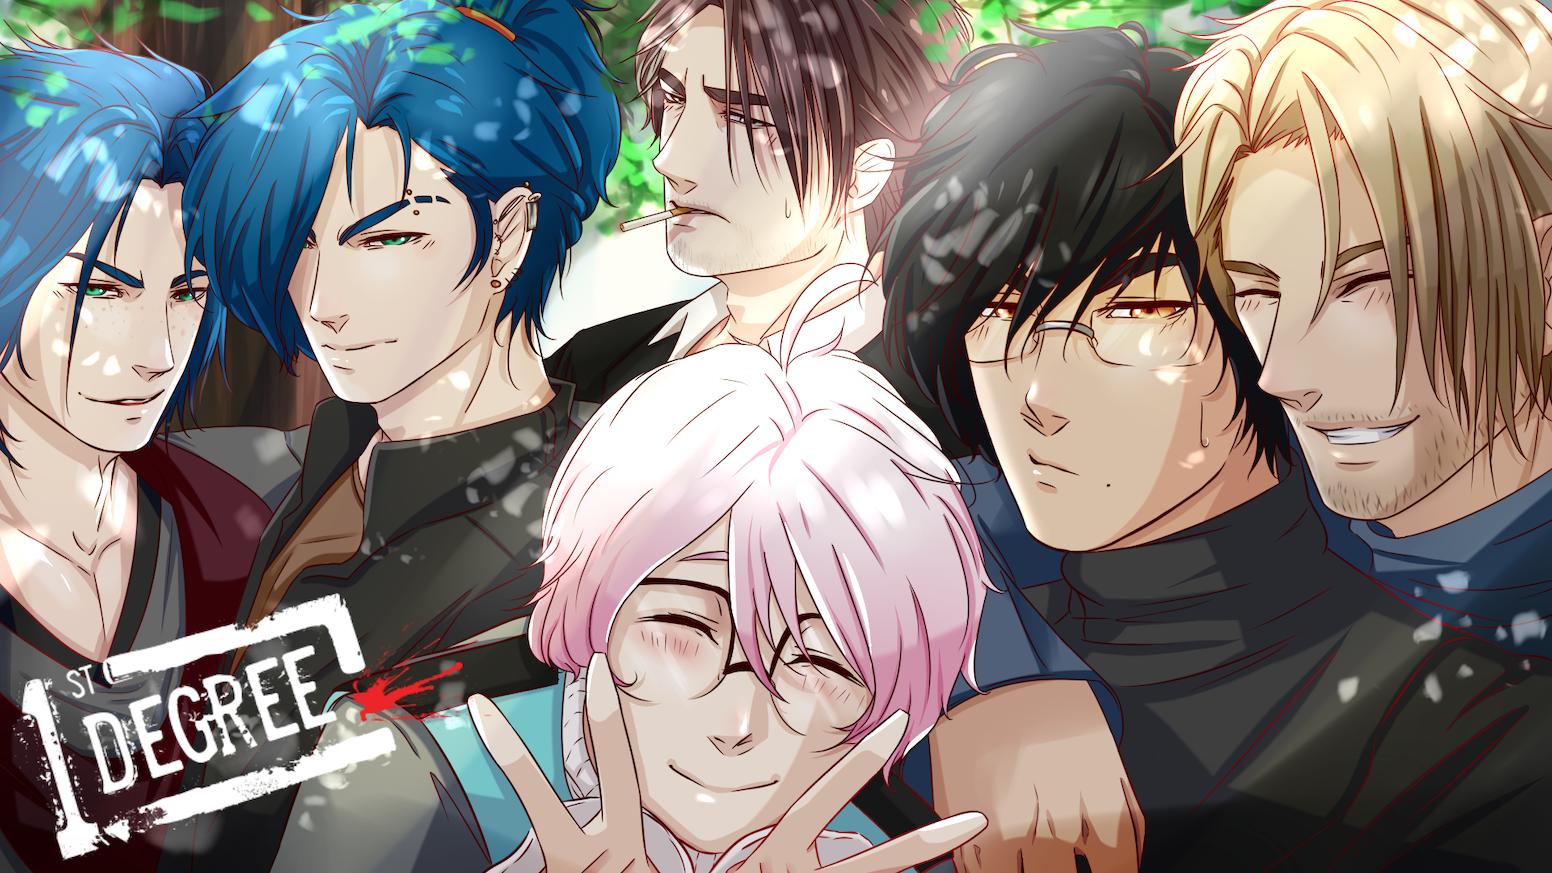 1st Degree: Murder-Mystery BL/Yaoi Visual Novel by Parival